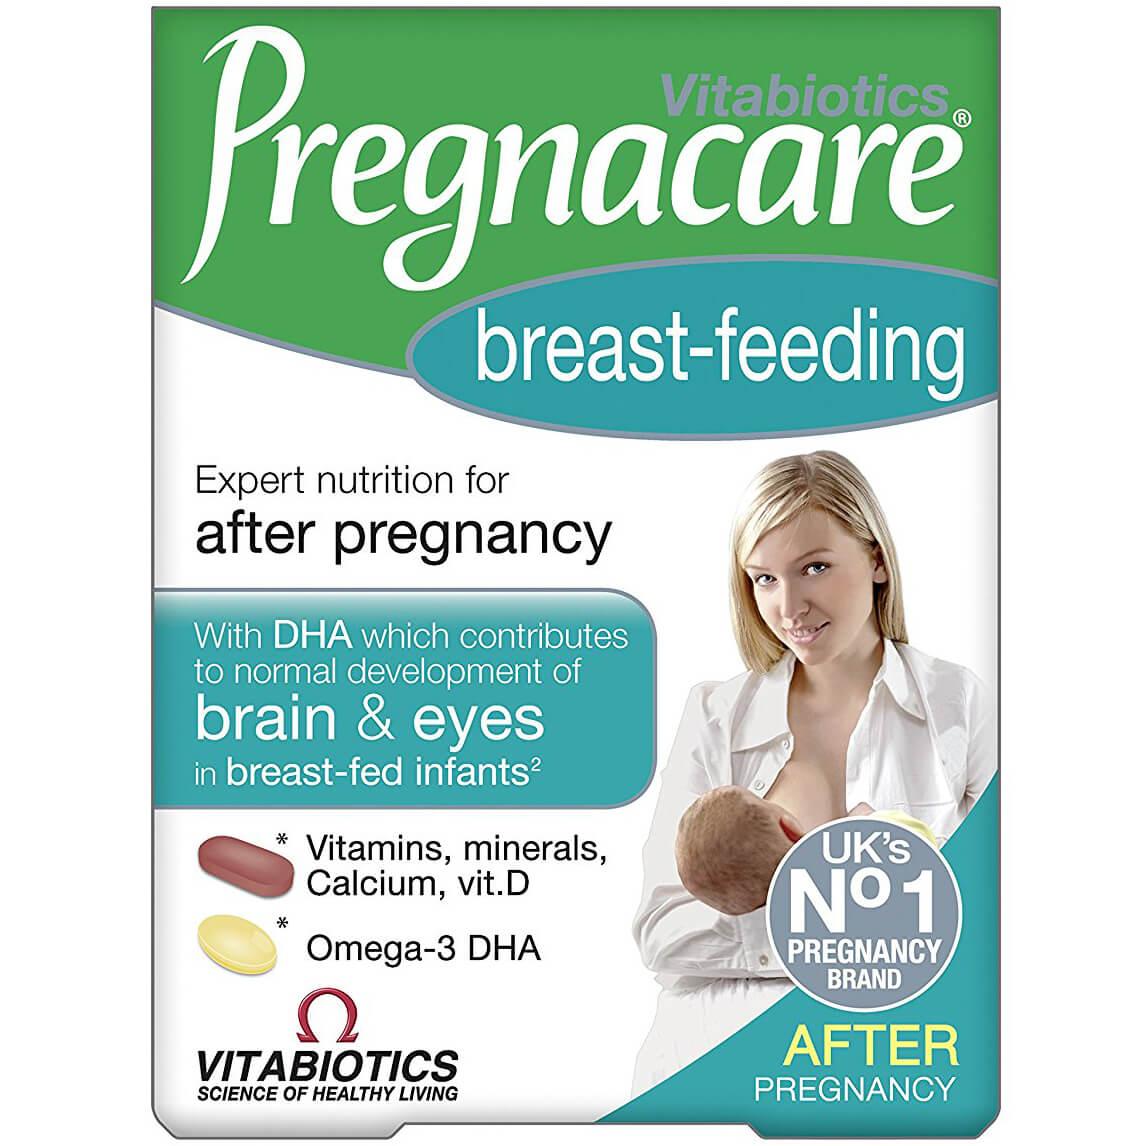 Vitabiotics Pregnacare Breast – FeedingΣυμπλήρωμα Διατροφήςγια Θηλάζουσες Μητέρες,Διπλή Συσκευασία 56tabs & 28caps